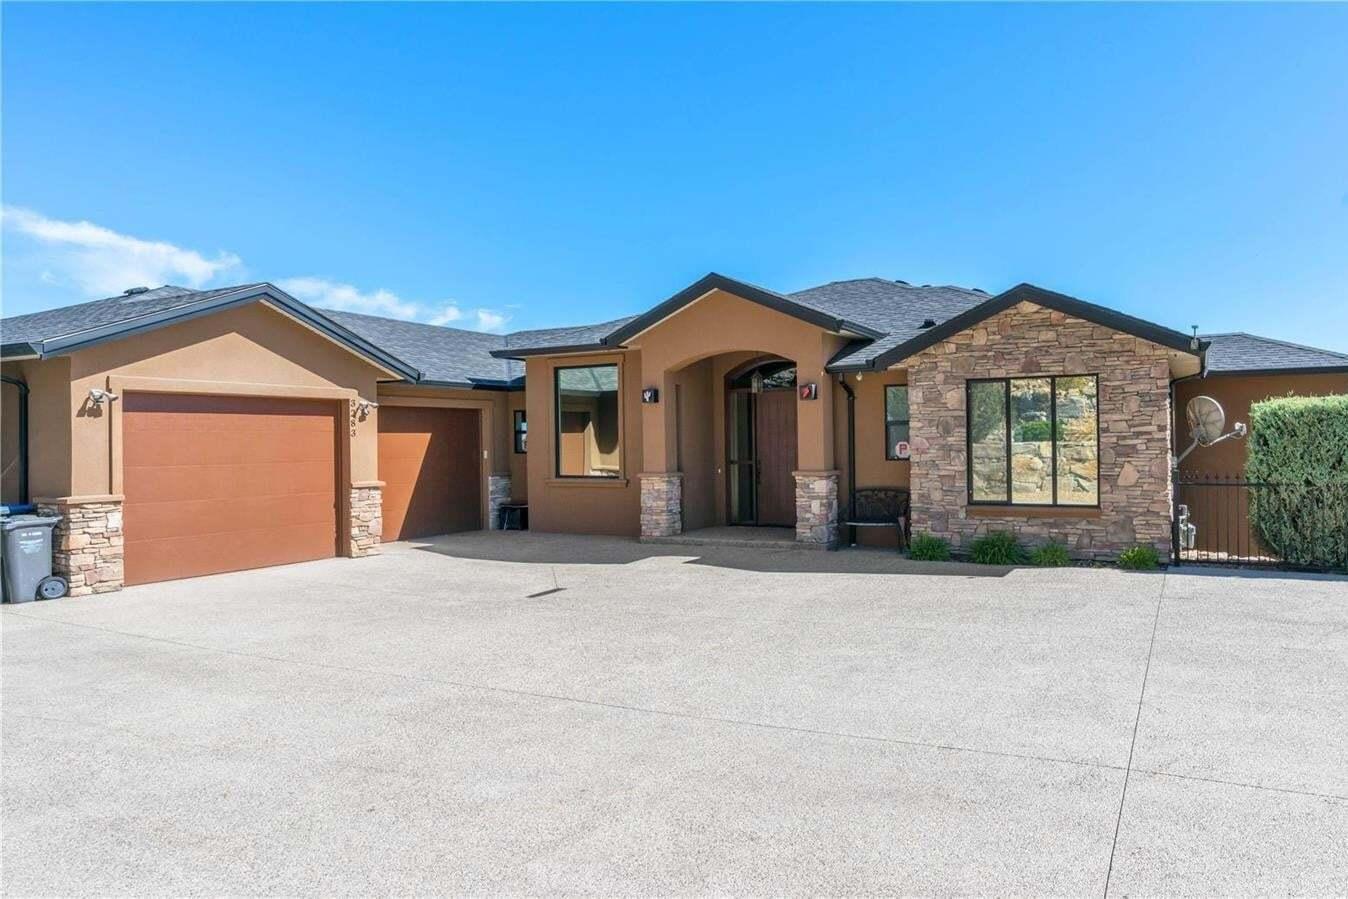 House for sale at 3283 Vineyard View Dr West Kelowna British Columbia - MLS: 10214864